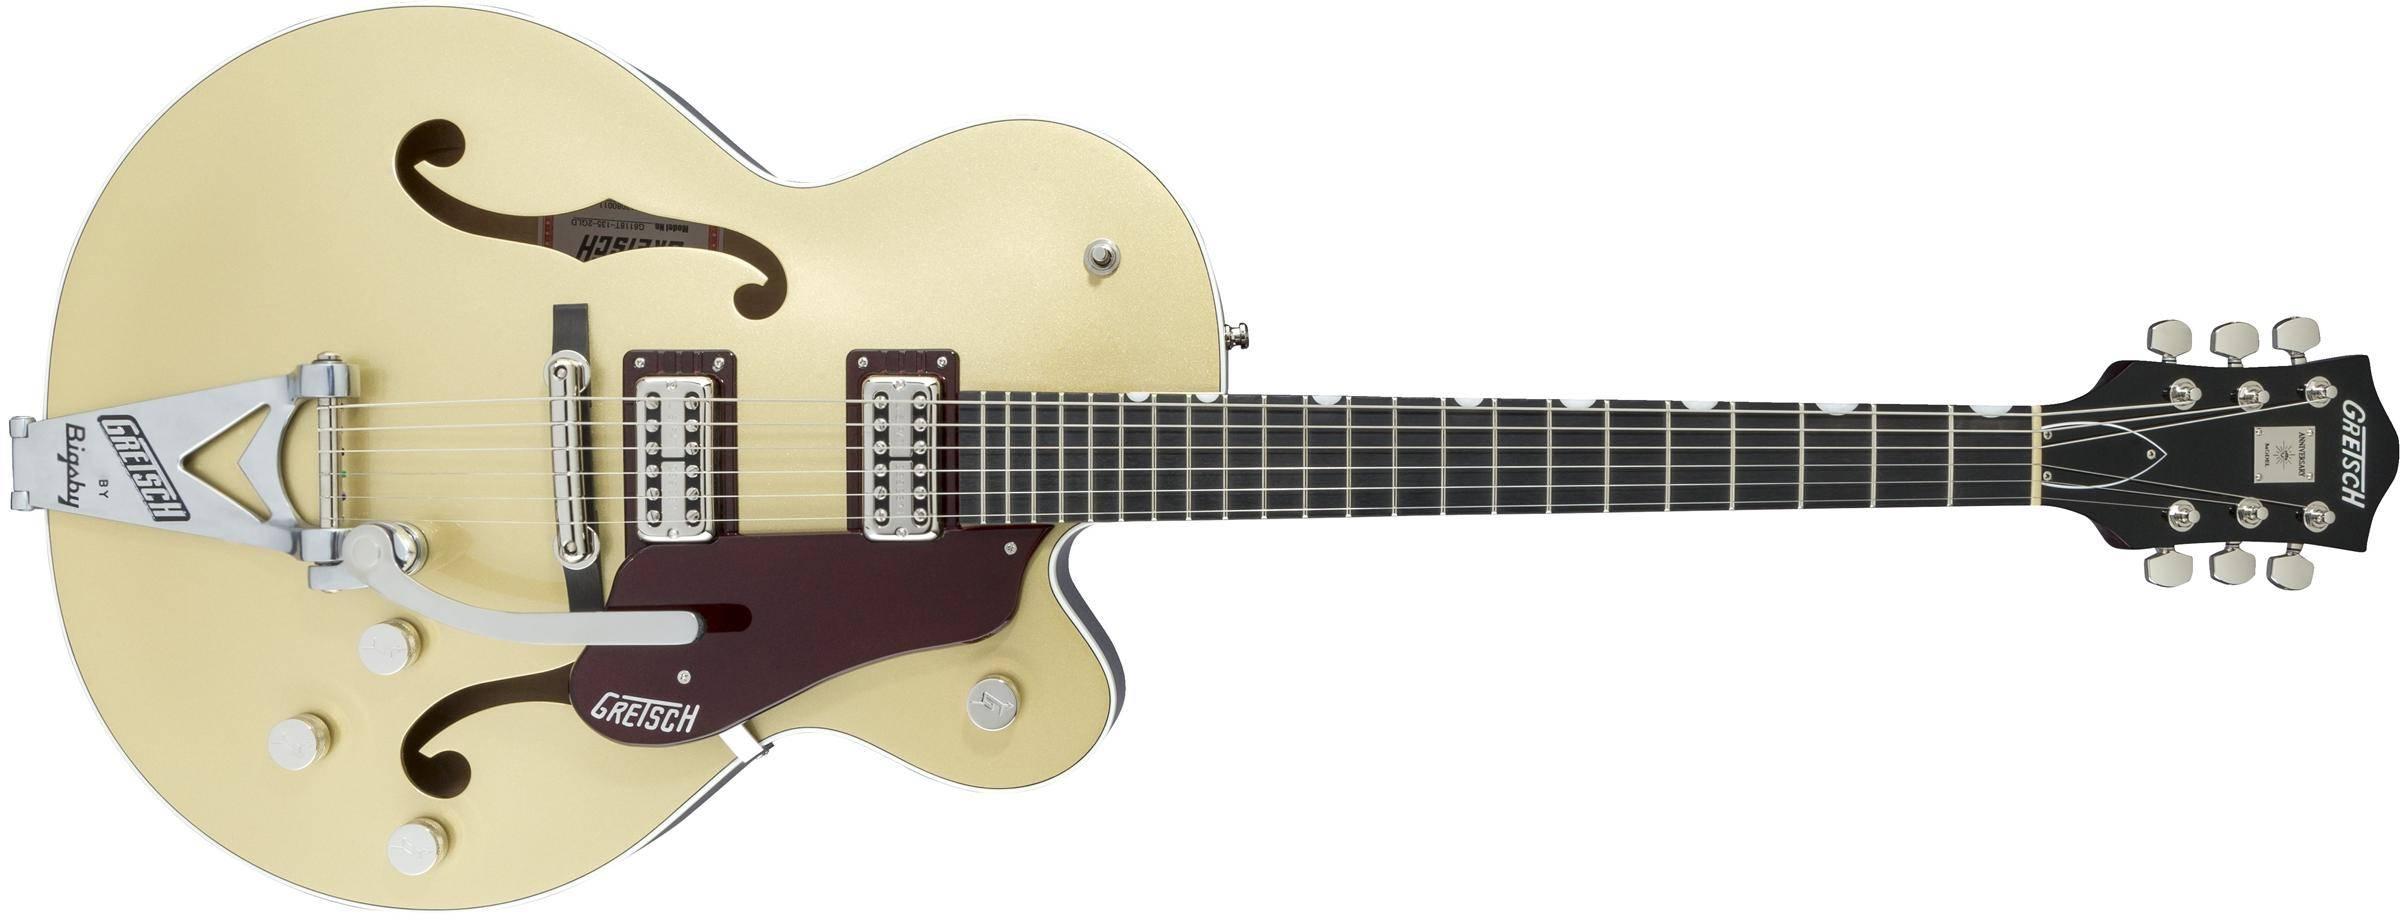 8f9b0ff82d Gretsch Guitars 135th Anniversary LTD G6118T-135 With Bigsby, Ebony  Fingerboard - Two-Tone Casino Gold/Dark Cherry - Long & McQuade Musical  Instruments